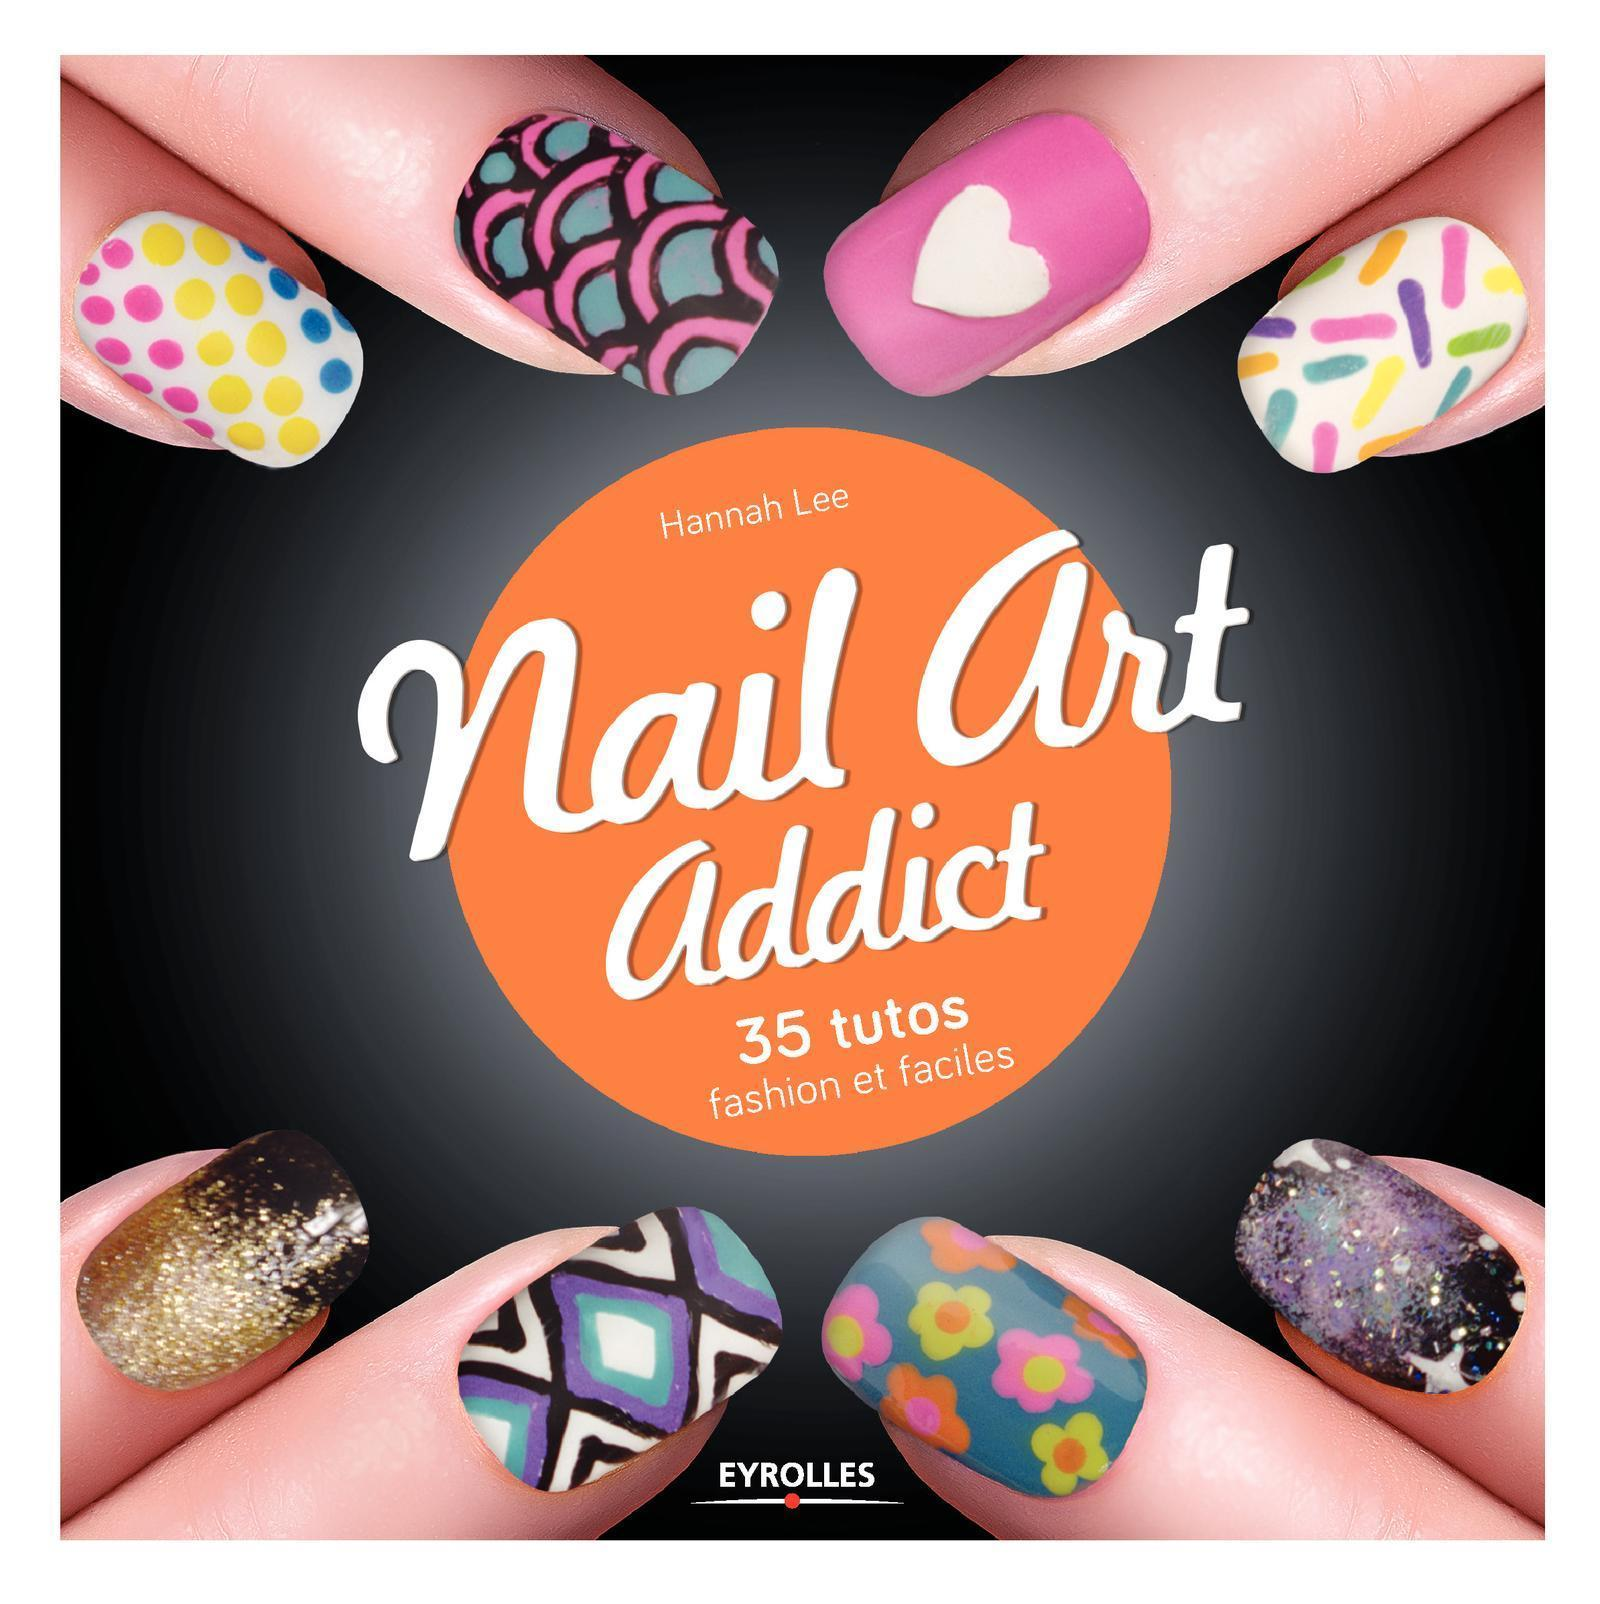 NAIL ART ADDICT - 35 TUTOS FASHION ET FACILES.